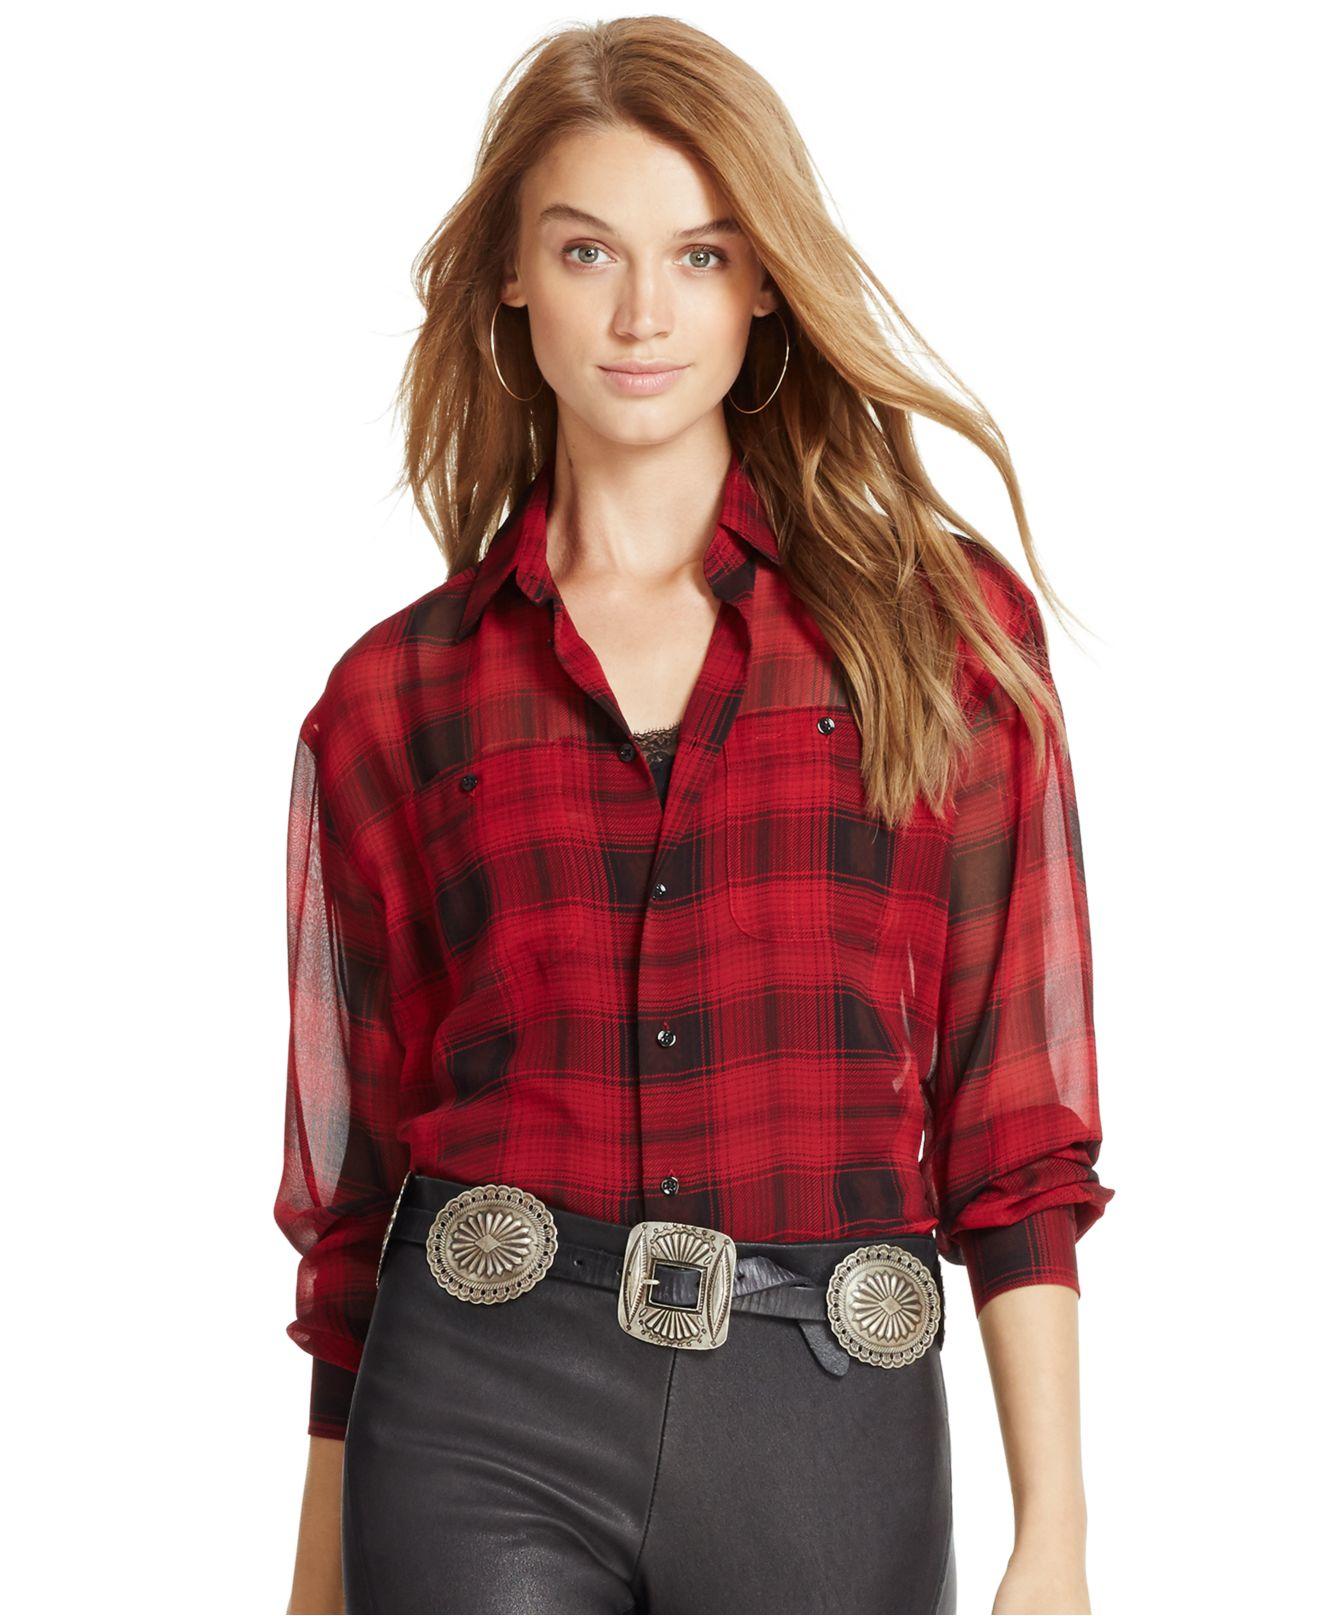 1728dfbb4 ... coupon code for lyst polo ralph lauren silk plaid shirt in black c10b7  c10dd